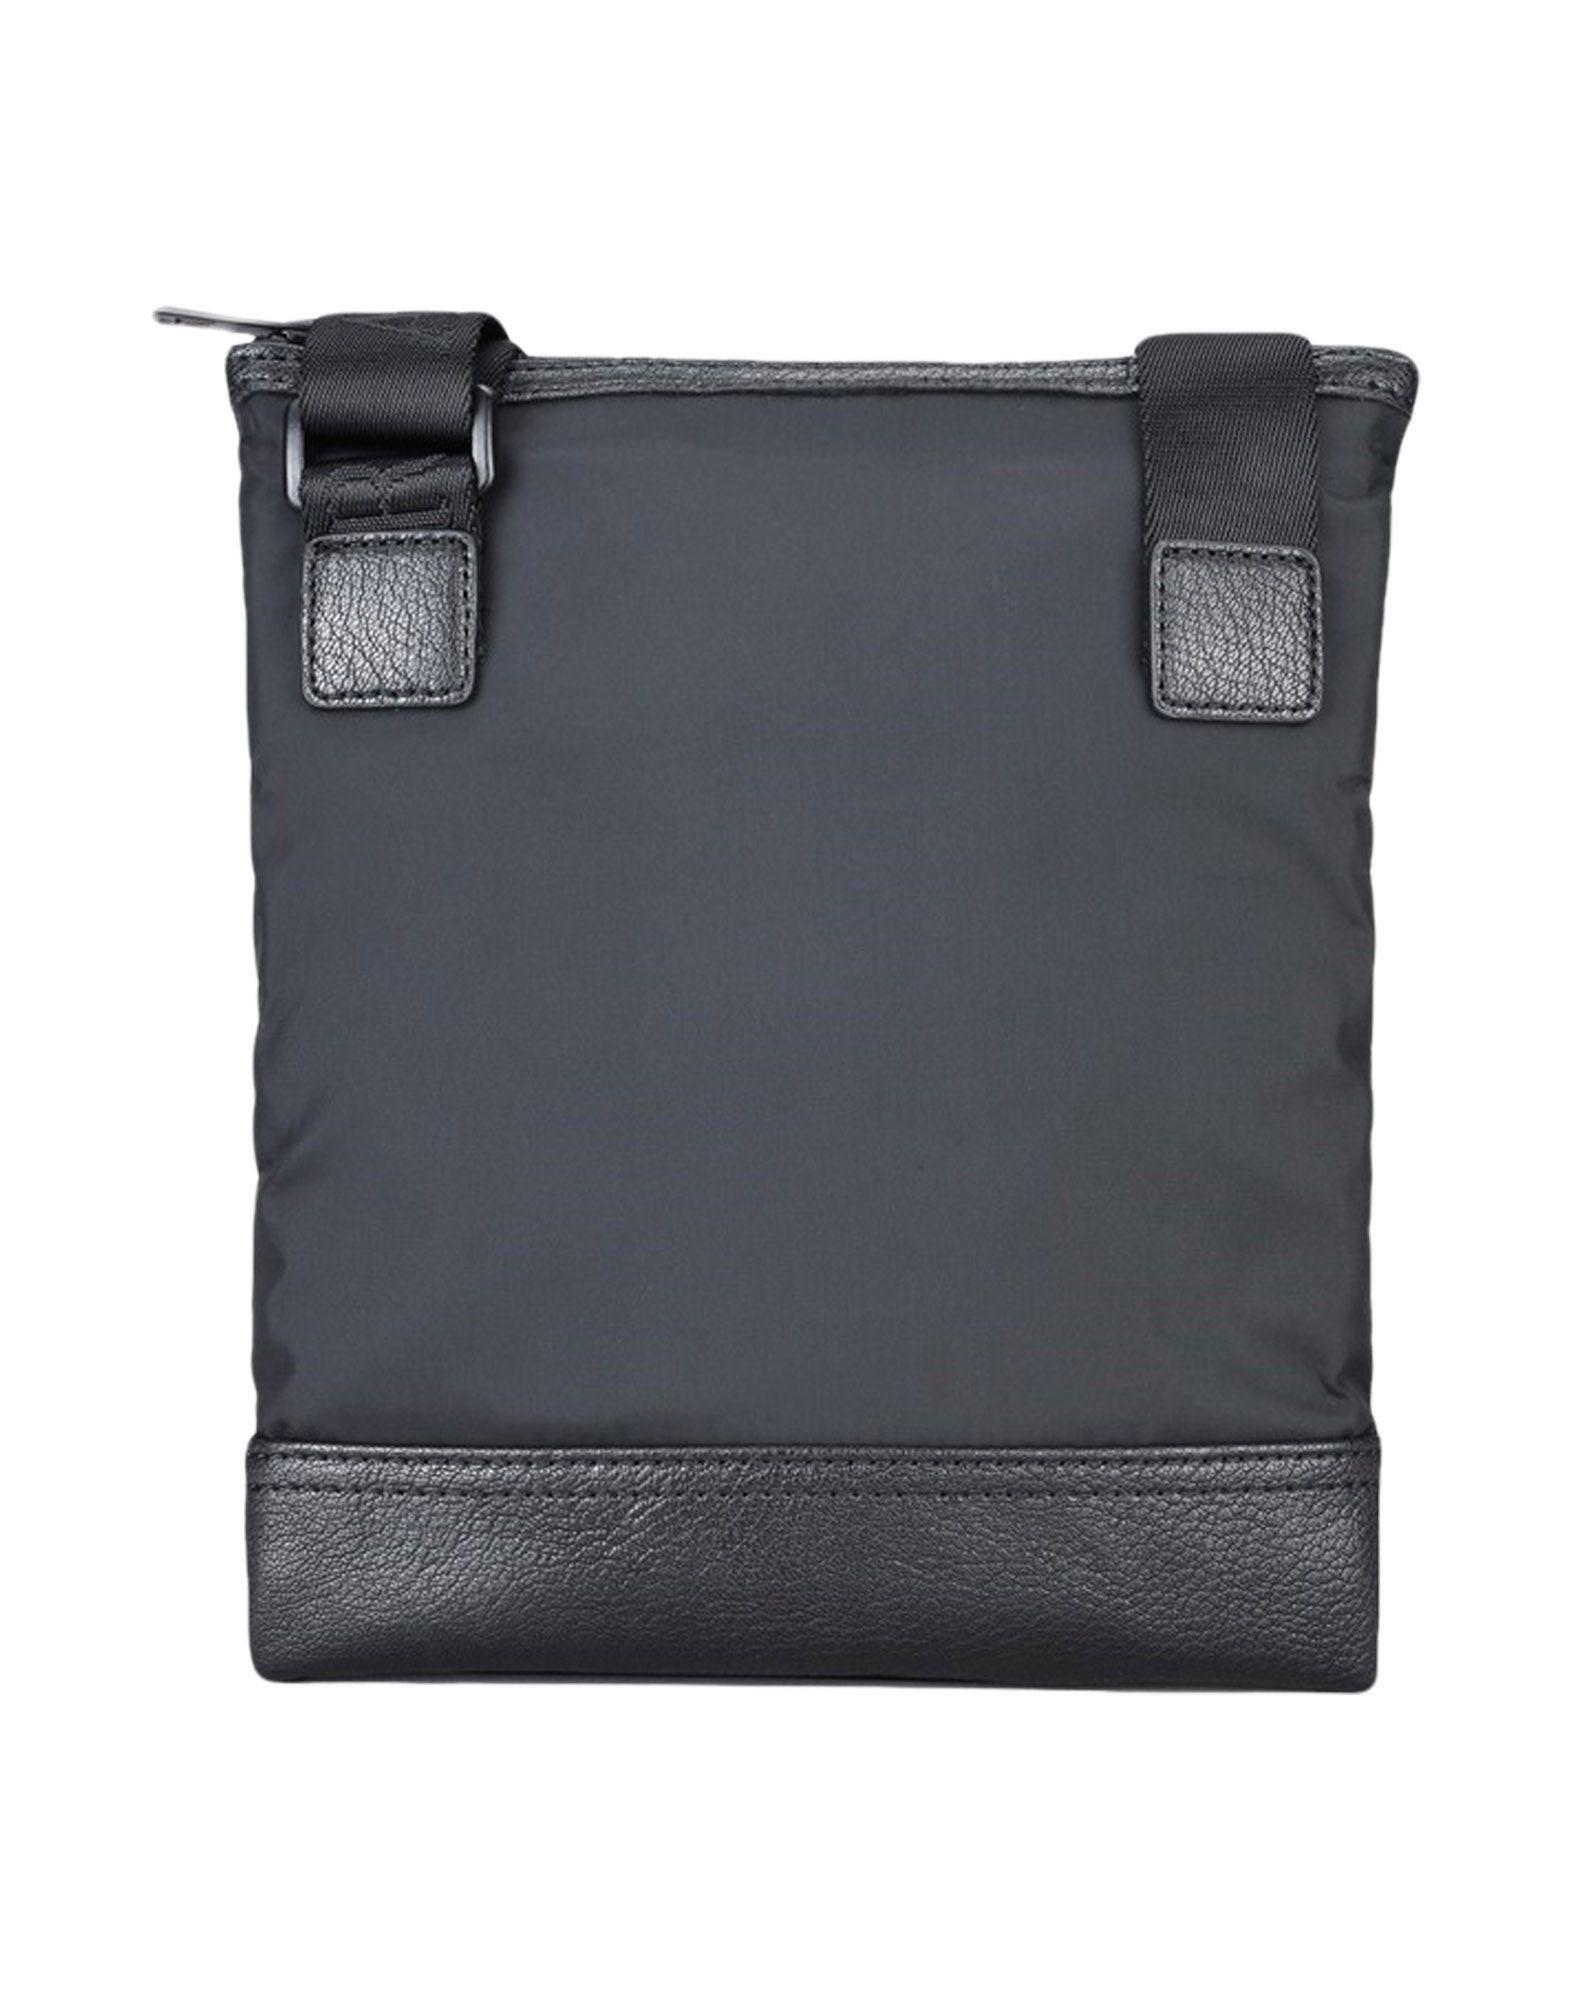 b31fc81adf4 Lyst - Armani Jeans Cross-body Bag in Black for Men